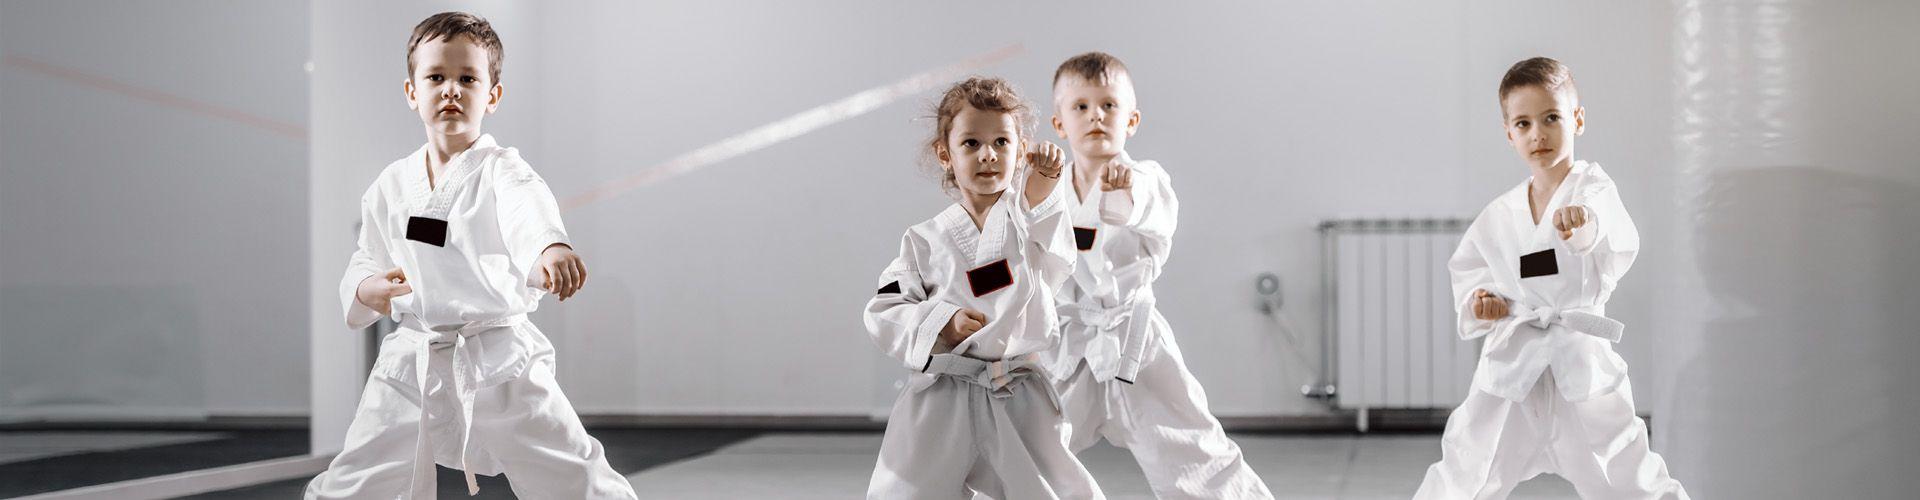 Escuela de Karate C.A. Montemar